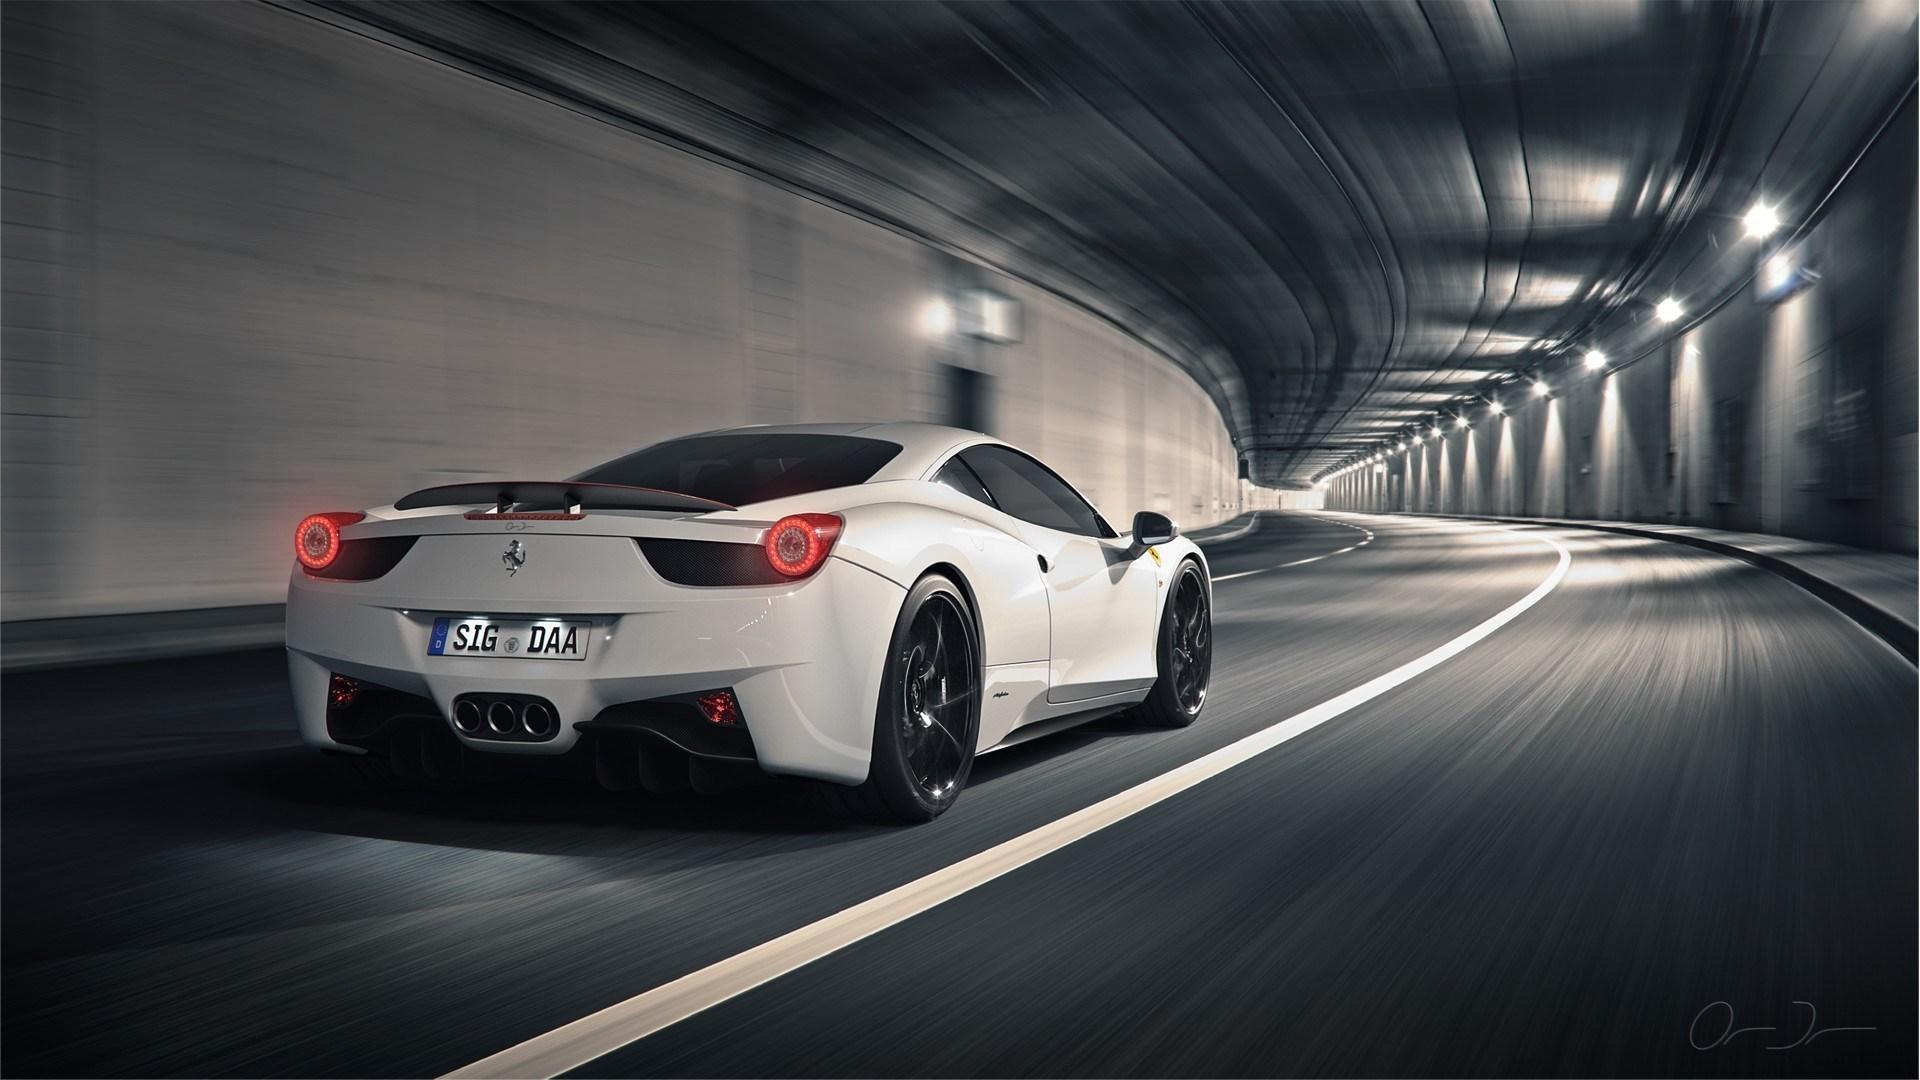 Free Download Ferrari On Hd Wallpapers Backgrounds For Desktop